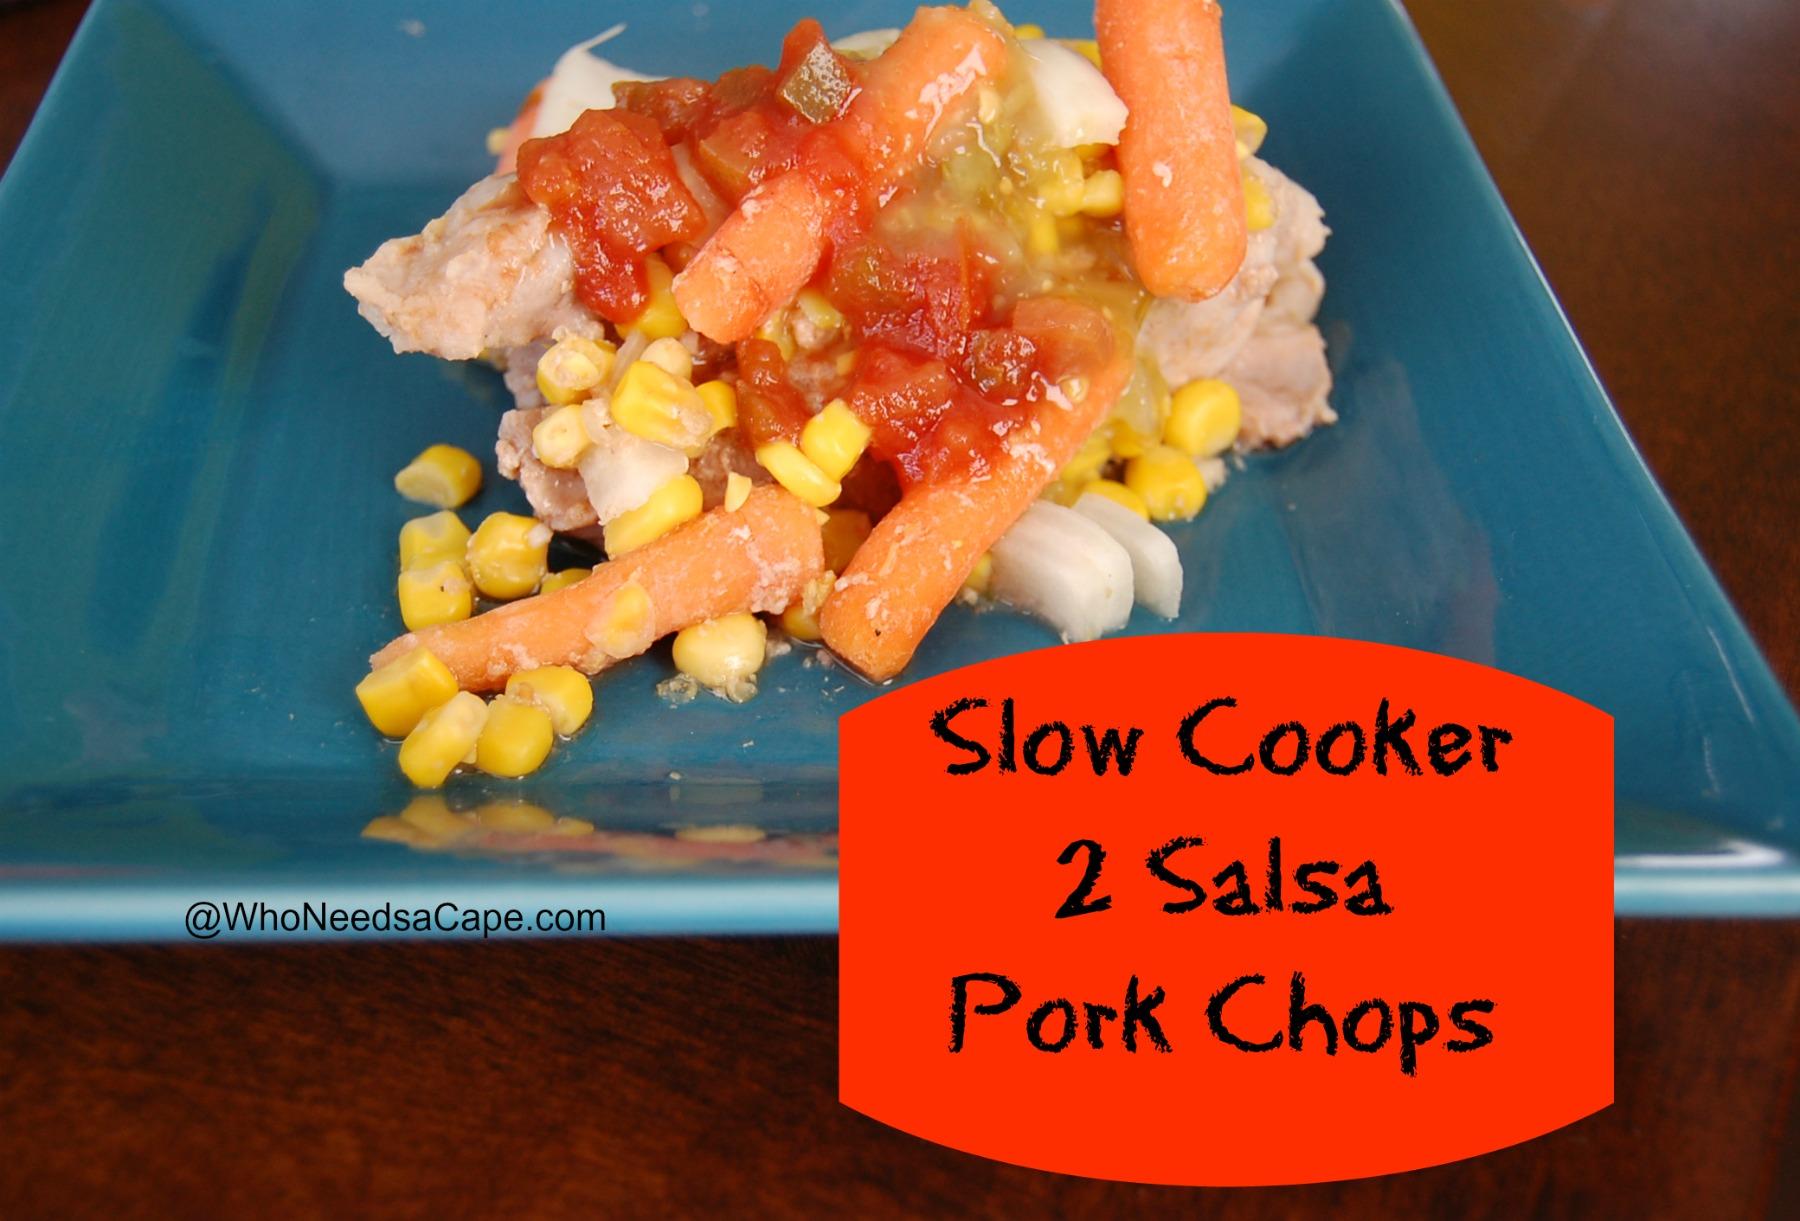 Slow Cooker 2 Salsa Pork Chops - Who Needs A Cape?